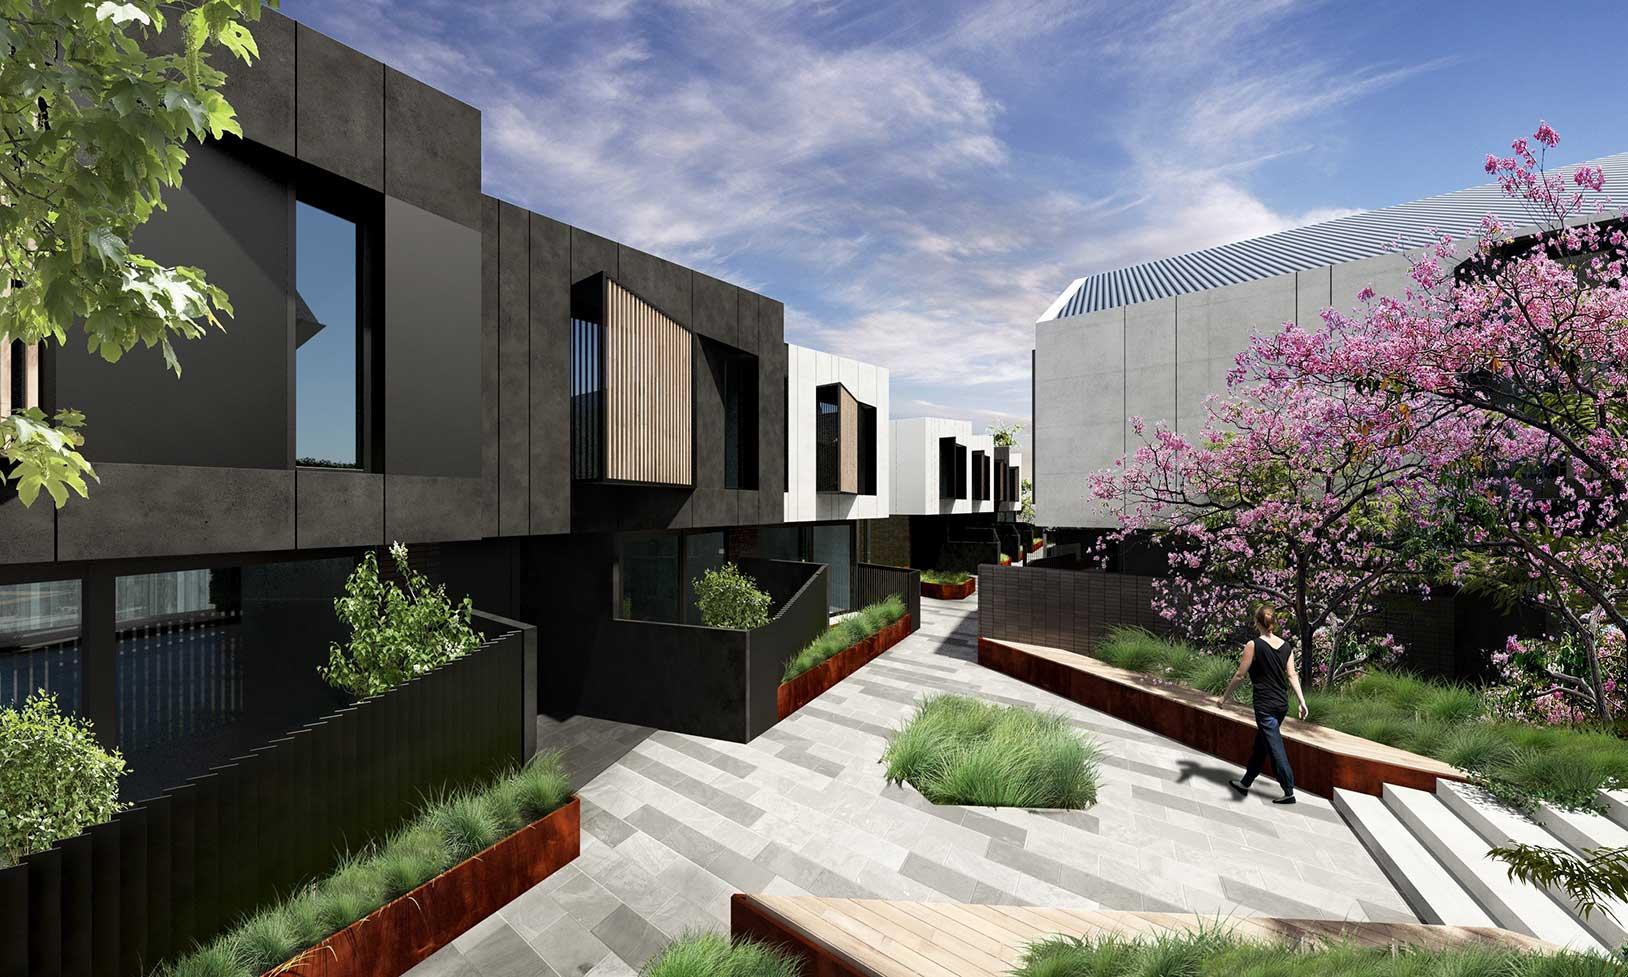 Saint George townhouse design communal courtyard